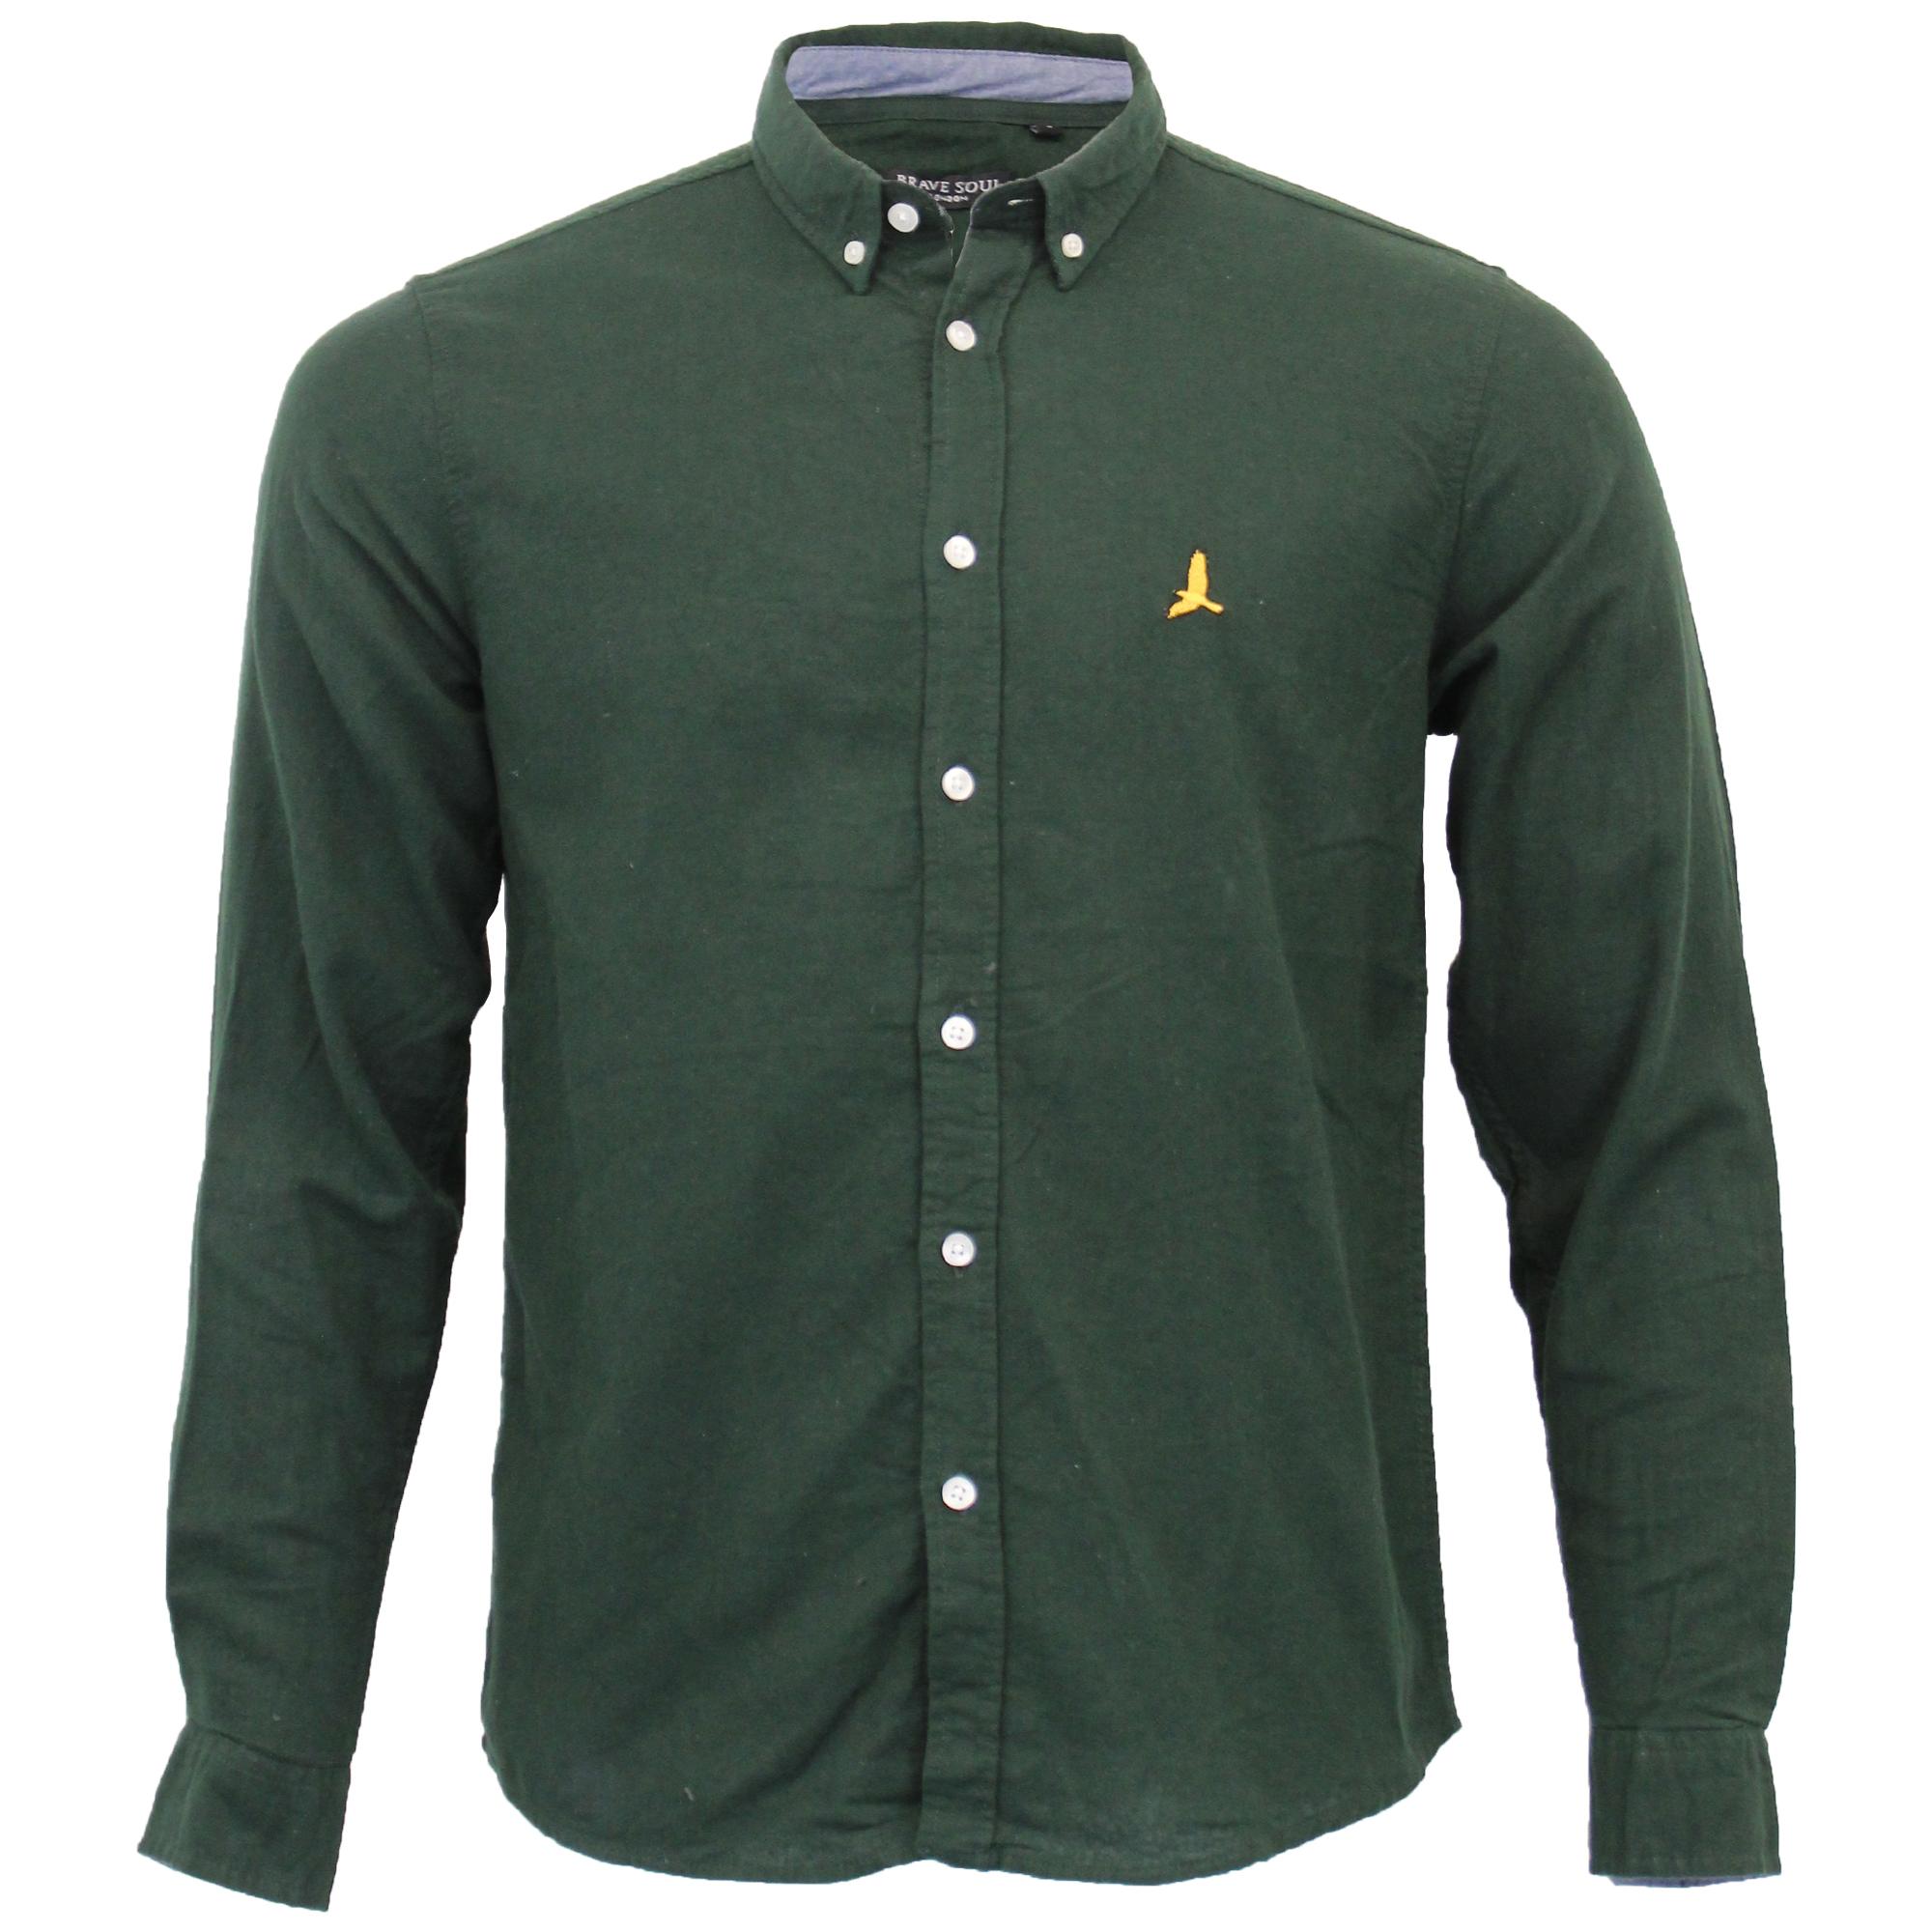 Mens-Brushed-Cotton-Shirt-Brave-Soul-Long-Sleeved-Flannel-HOLMES-Casual-Designer thumbnail 11